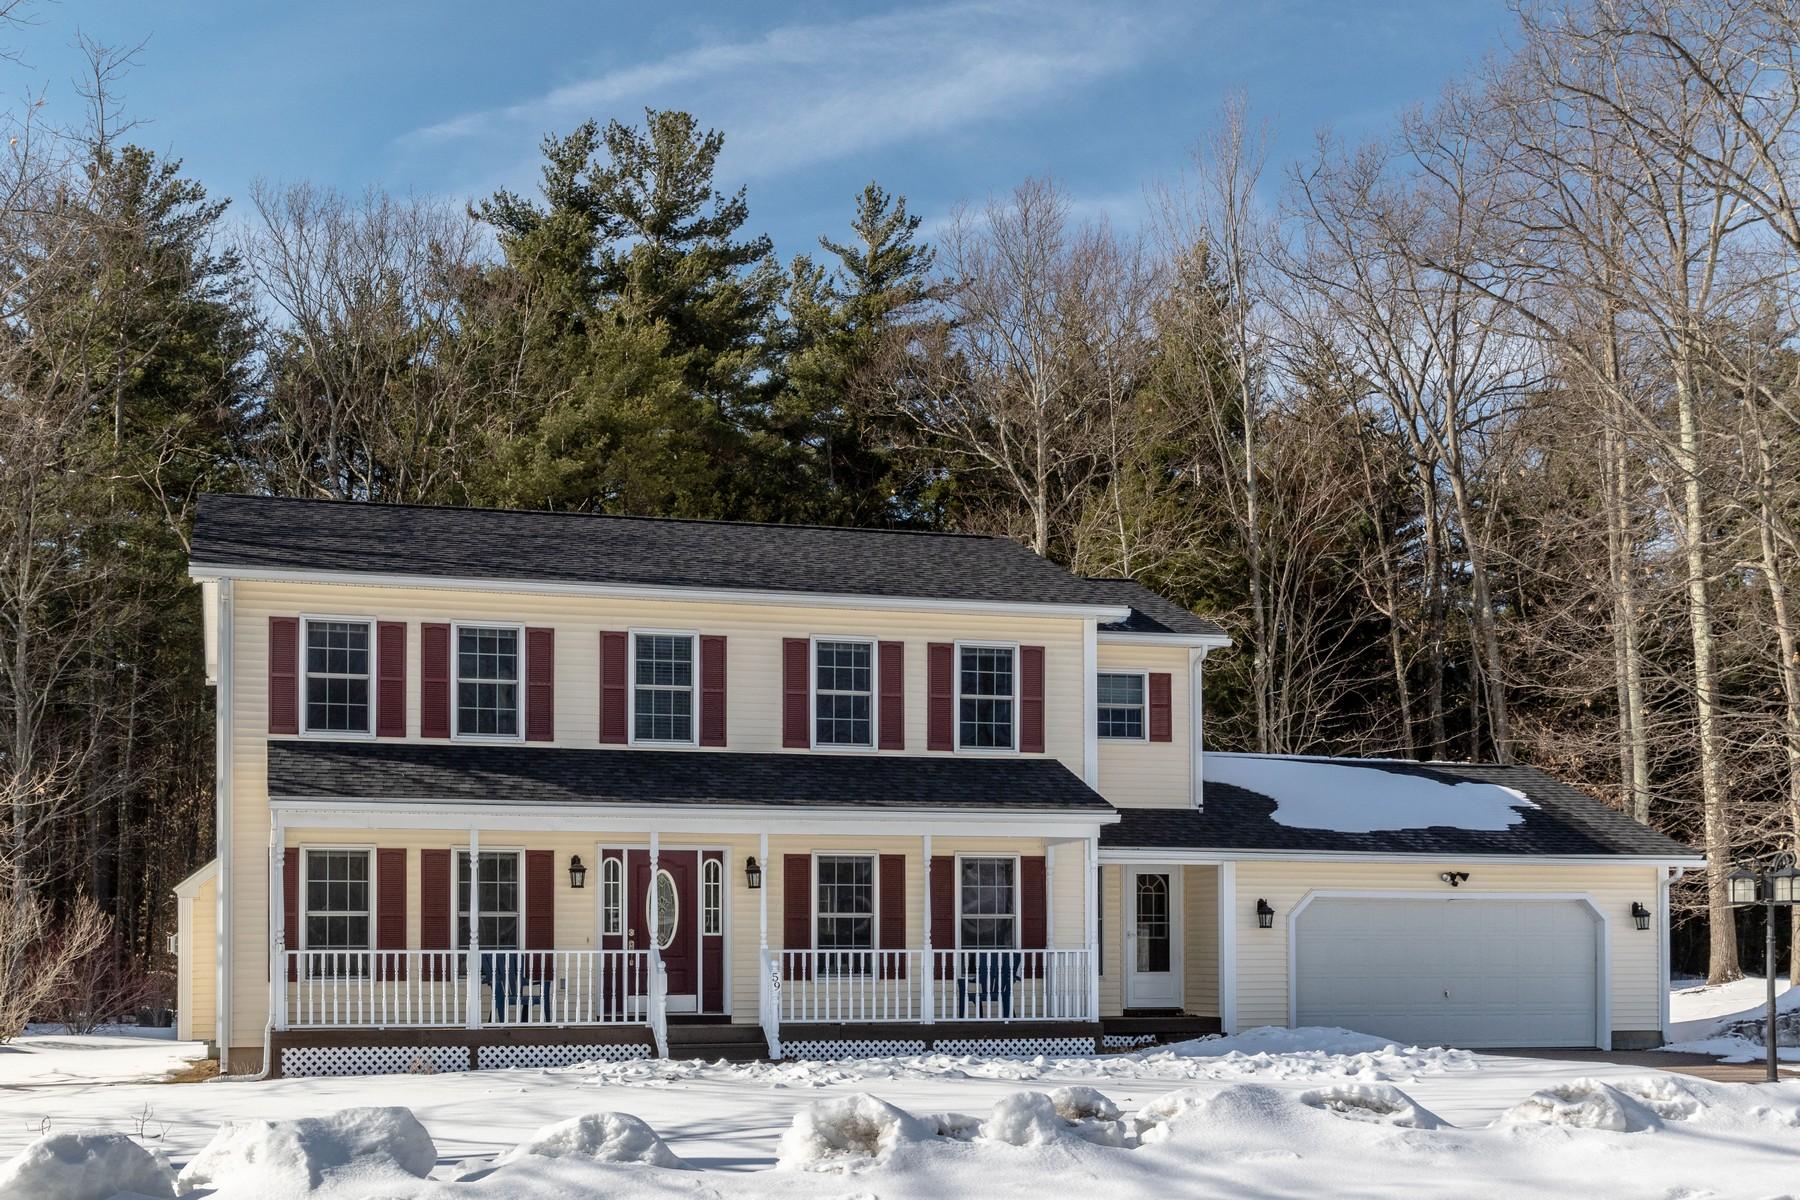 Single Family Home for Sale at 59 Overlake Dr, Milton 59 Overlake Dr Milton, Vermont 05468 United States